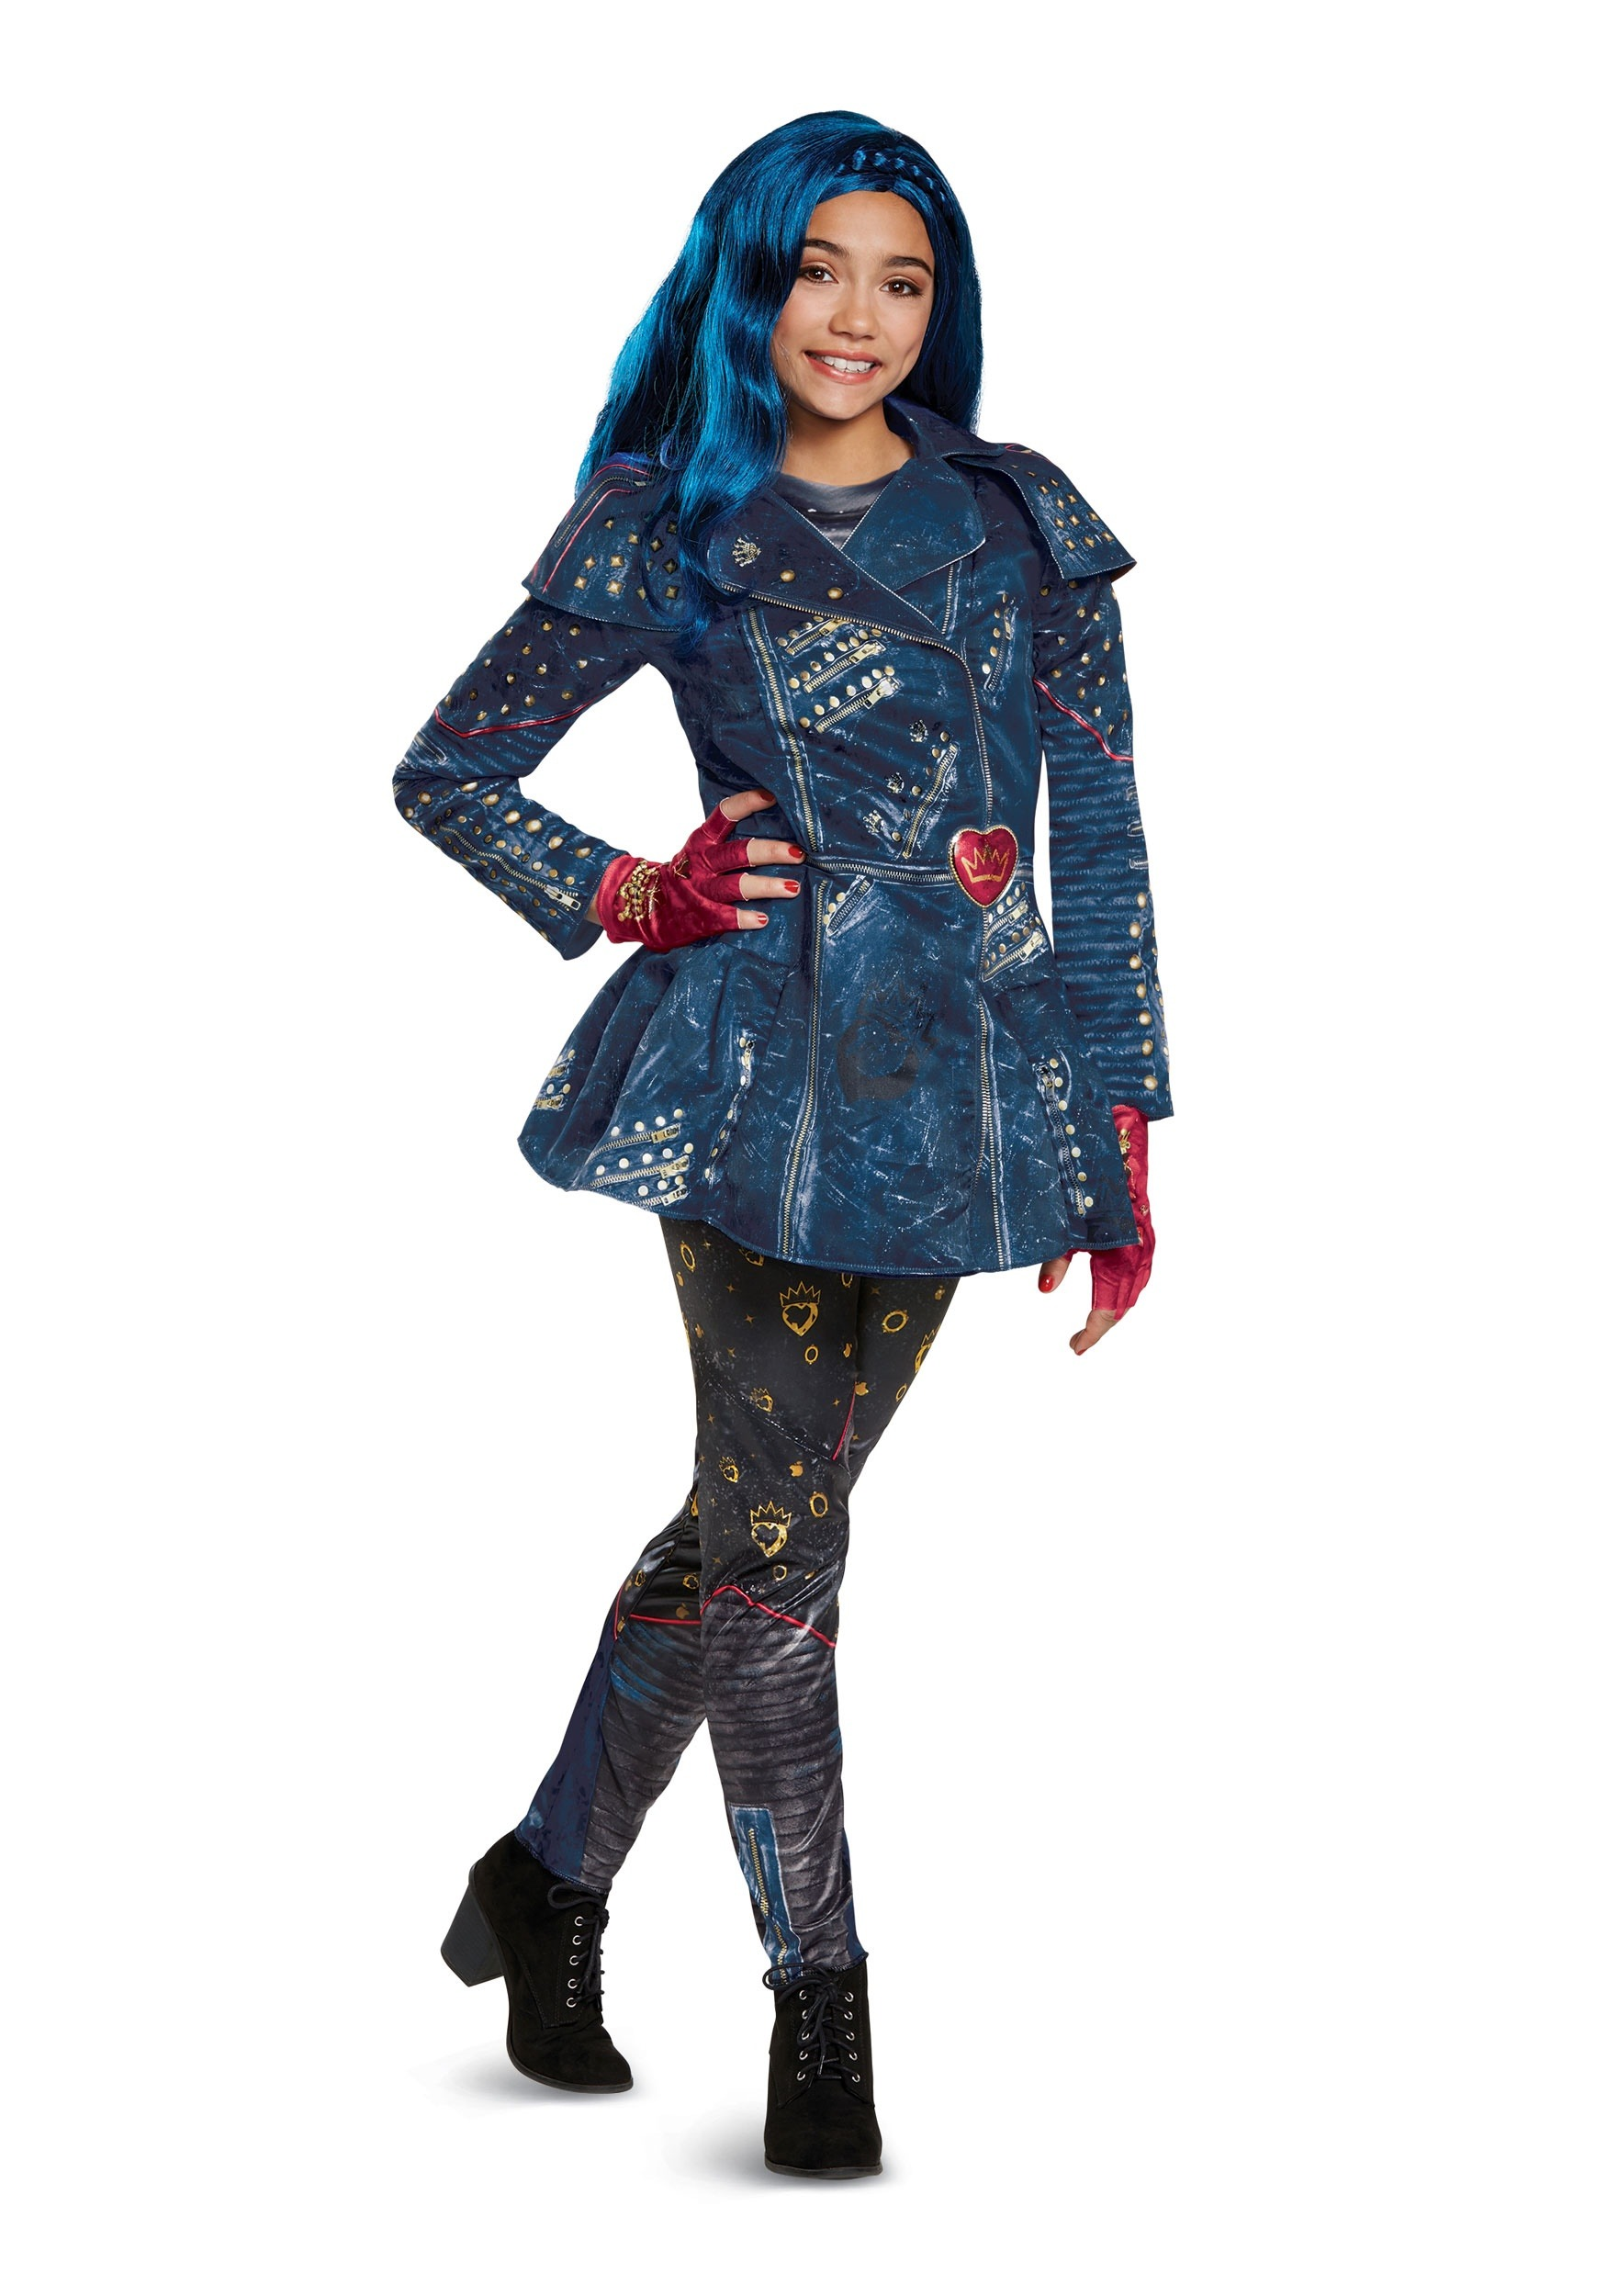 Girls Evie Deluxe Costume From Descendants 2